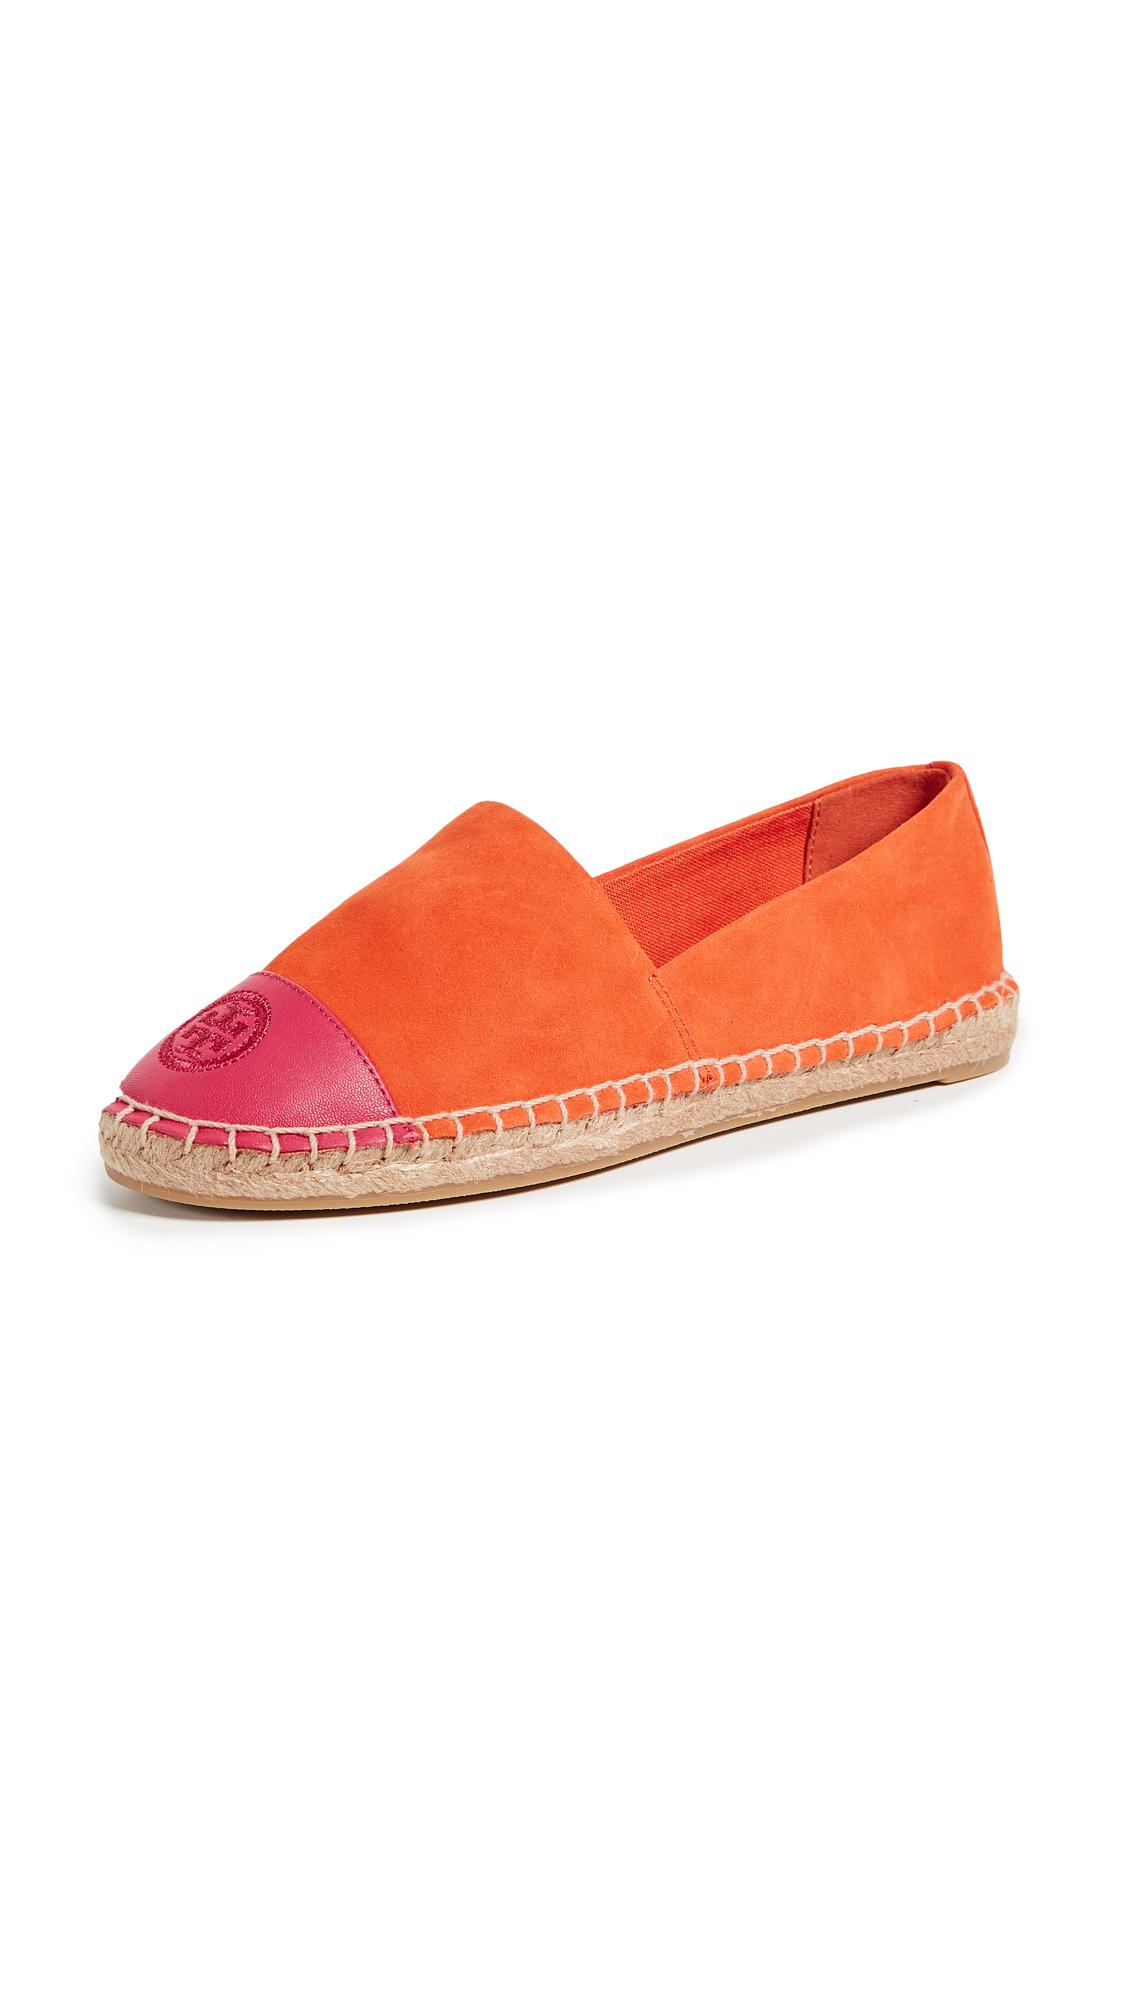 Tory Burch Colorblock Flat Espadrilles - Sweet Tangerine/Bright Azalea